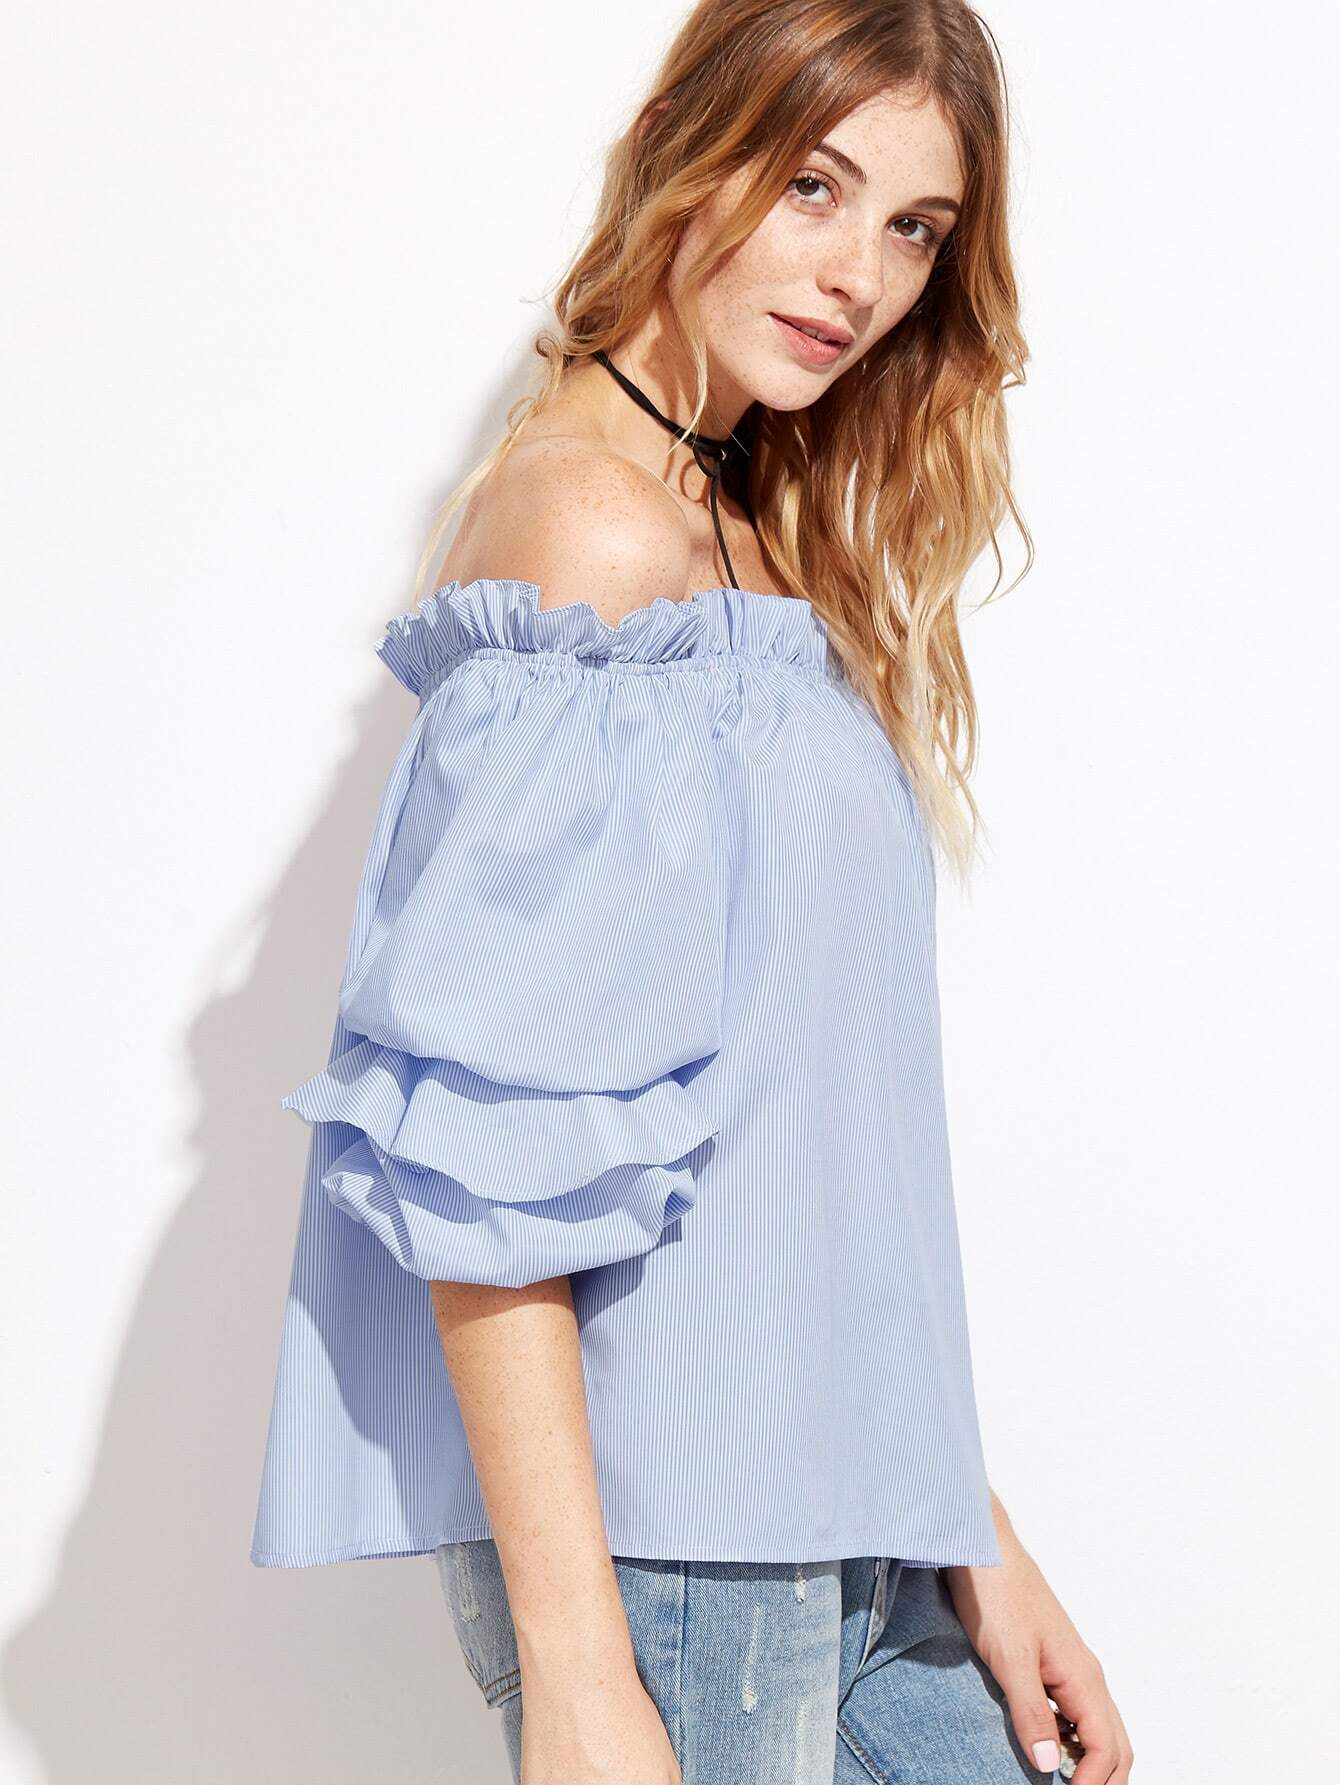 blouse160926705_2